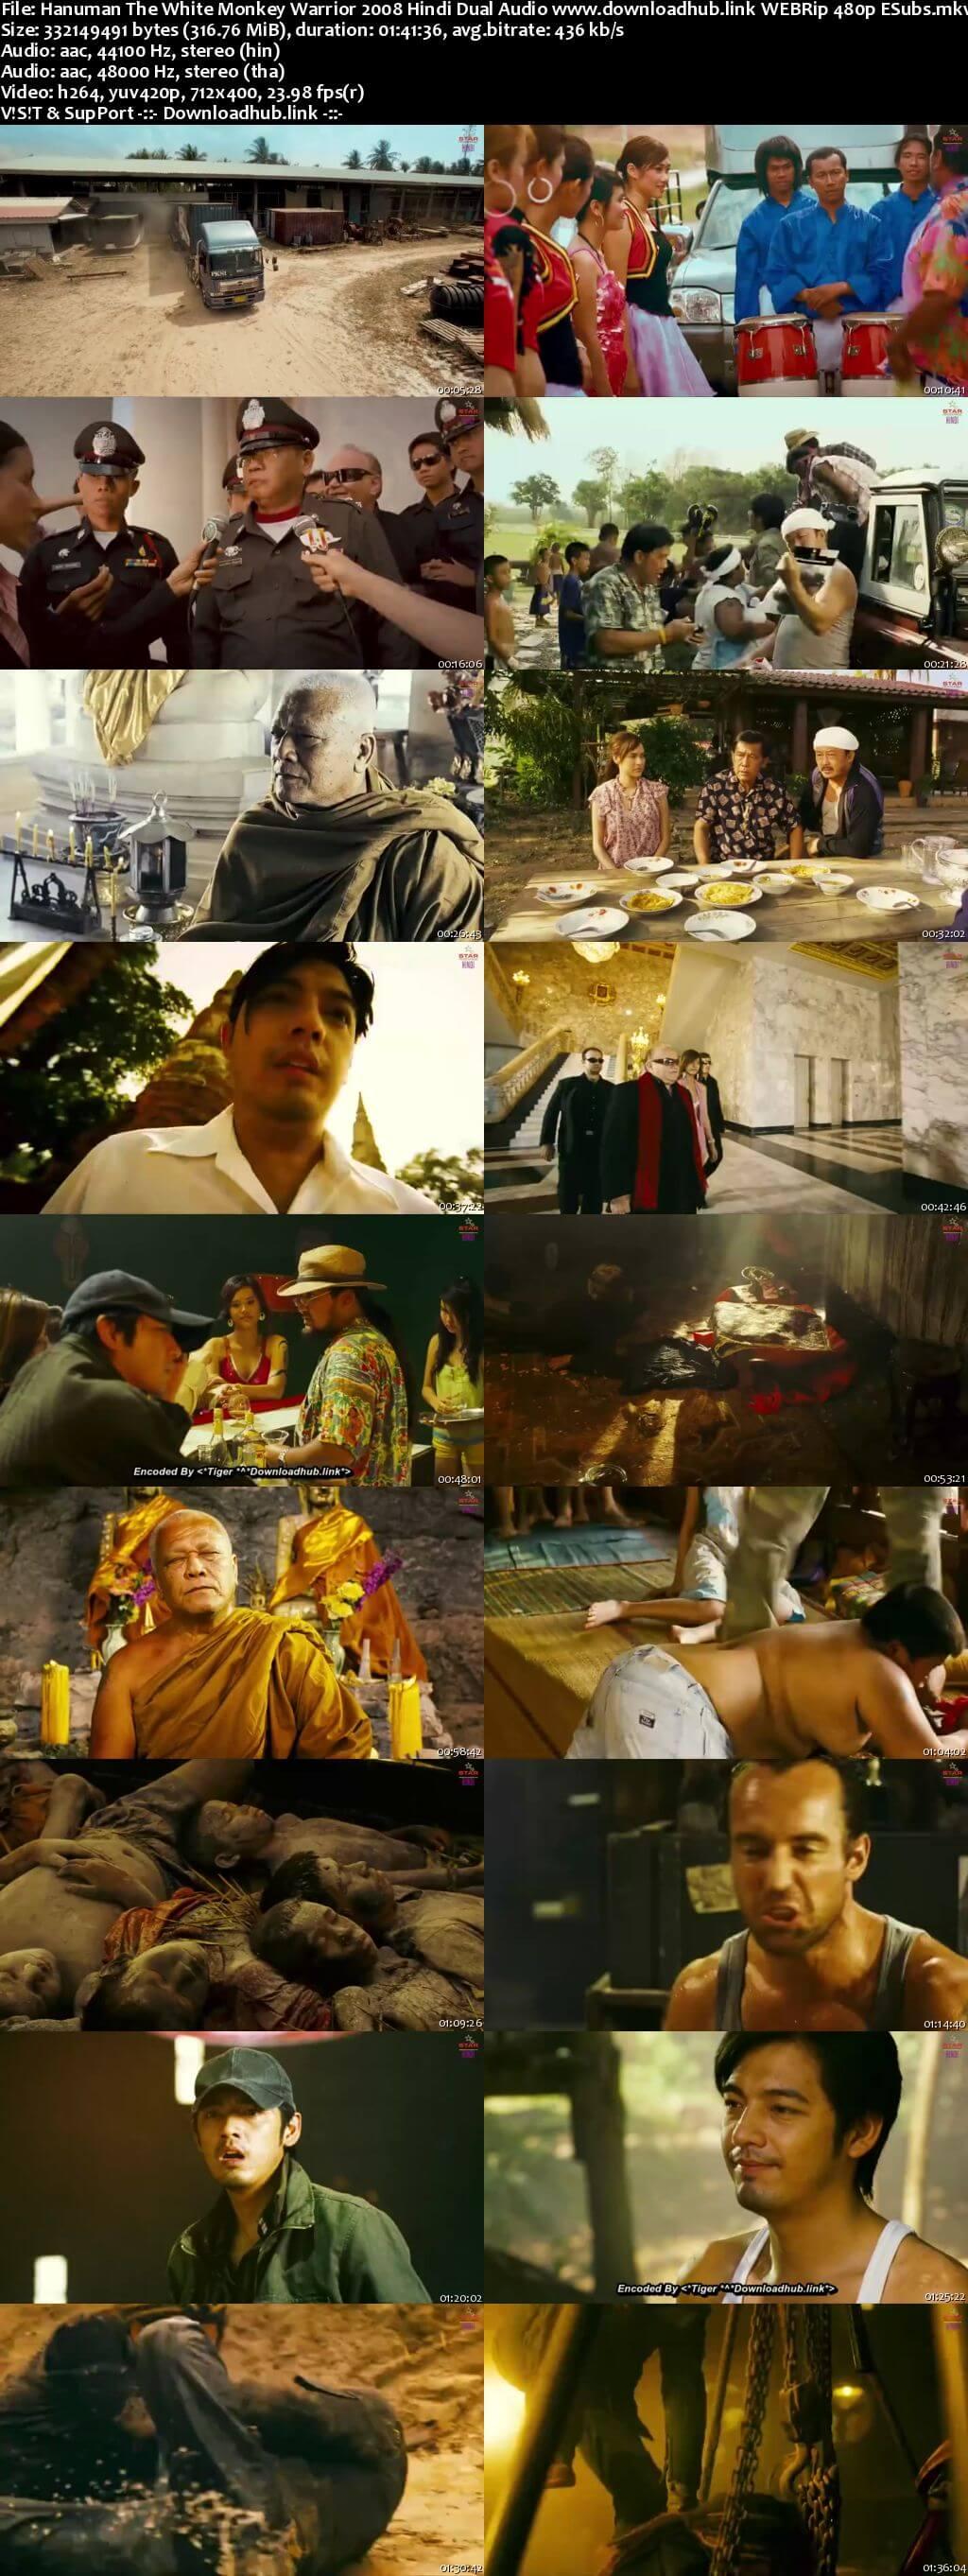 Hanuman The White Monkey Warrior 2008 Hindi Dual Audio 300MB WEBRip 480p ESubs